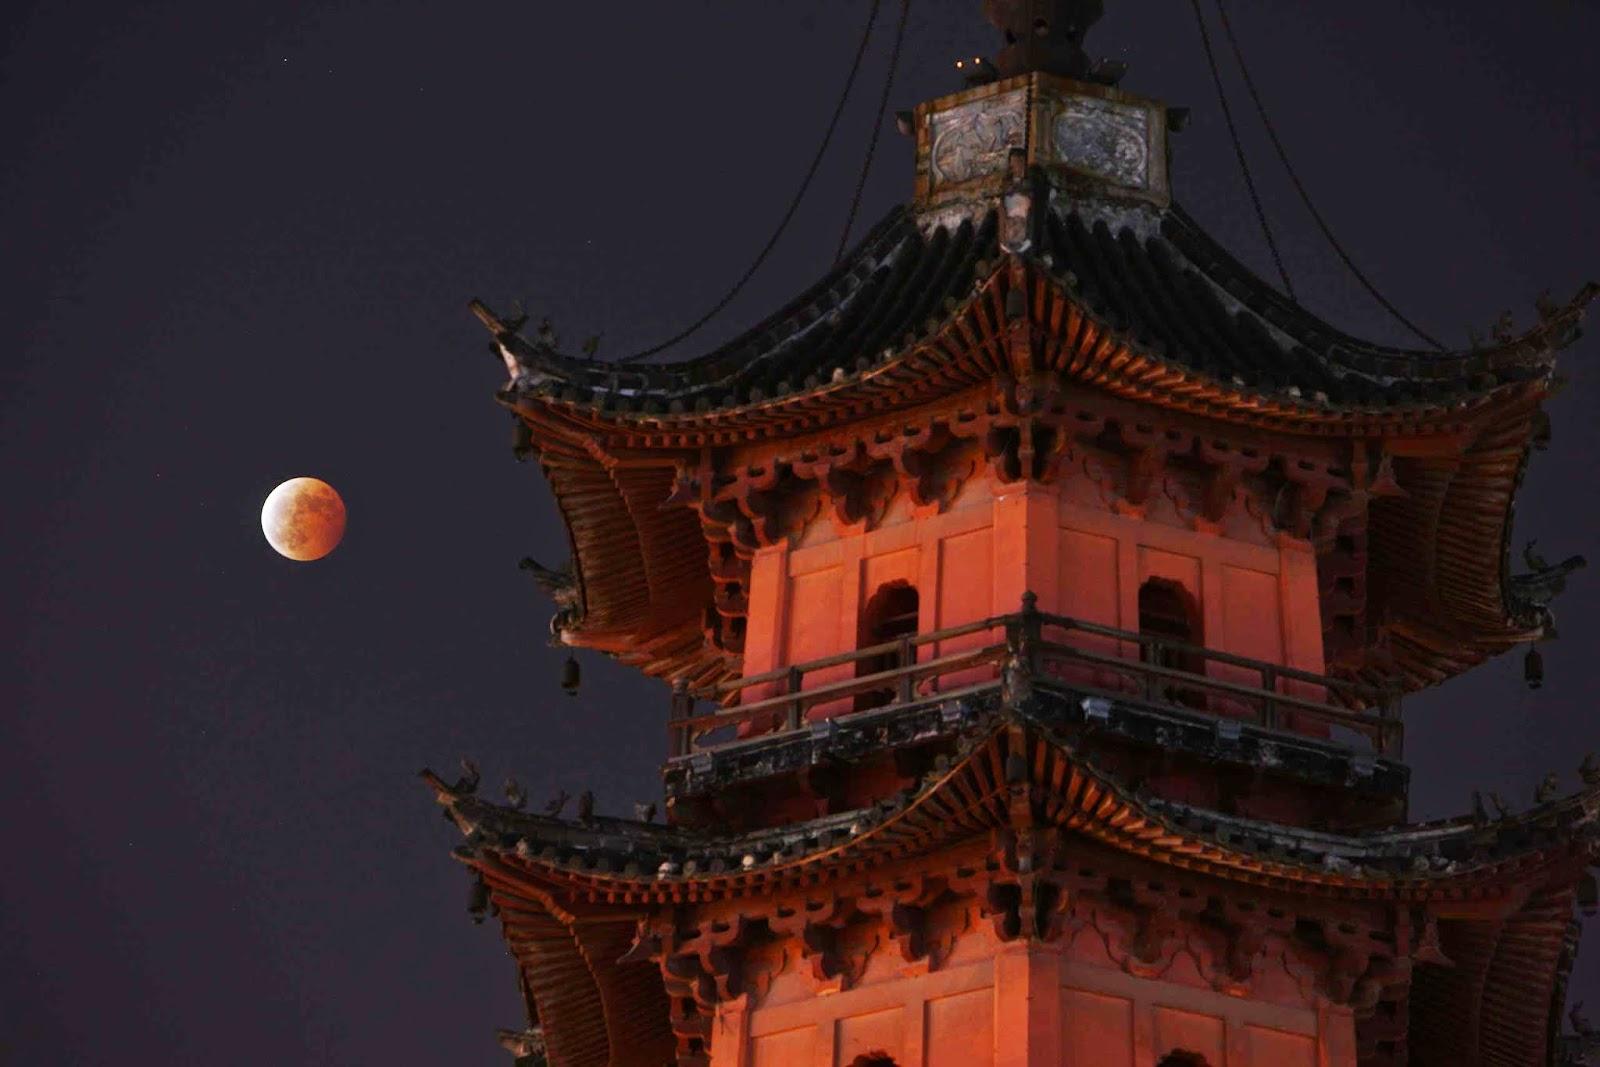 Koleksi Gambar Gerhana Bulan Penuh